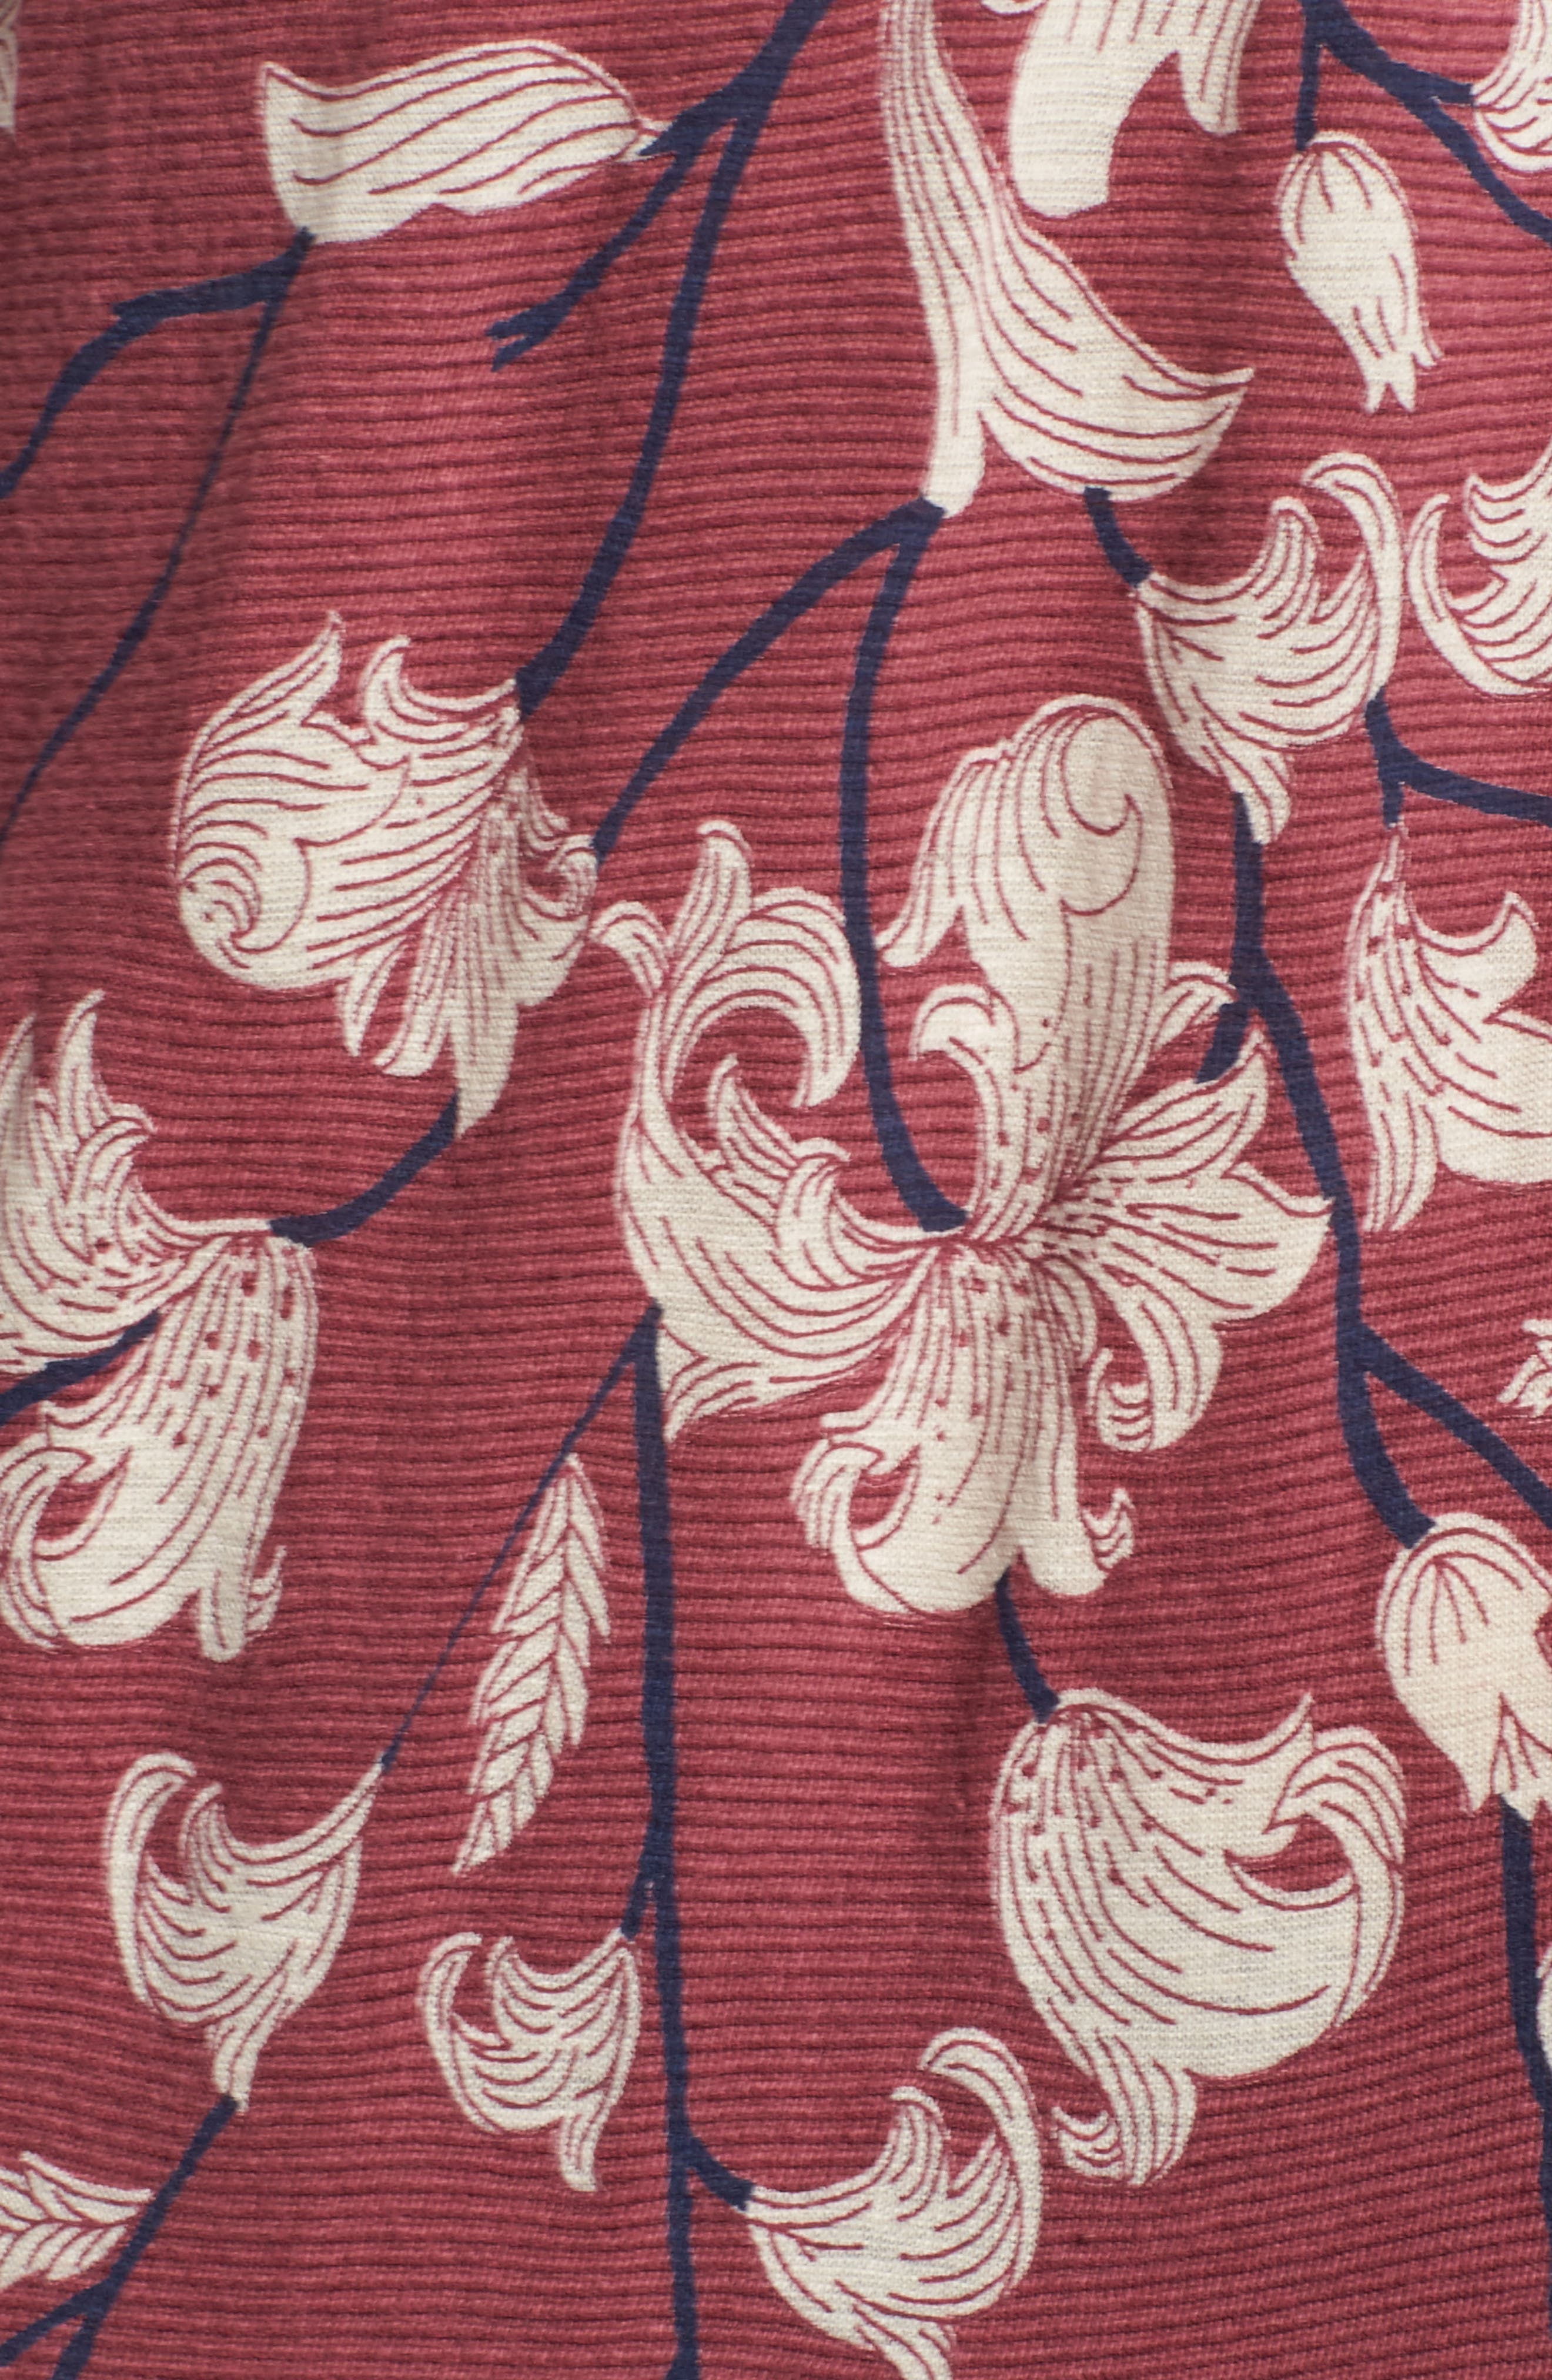 Lace Inset Print Top,                             Alternate thumbnail 5, color,                             660